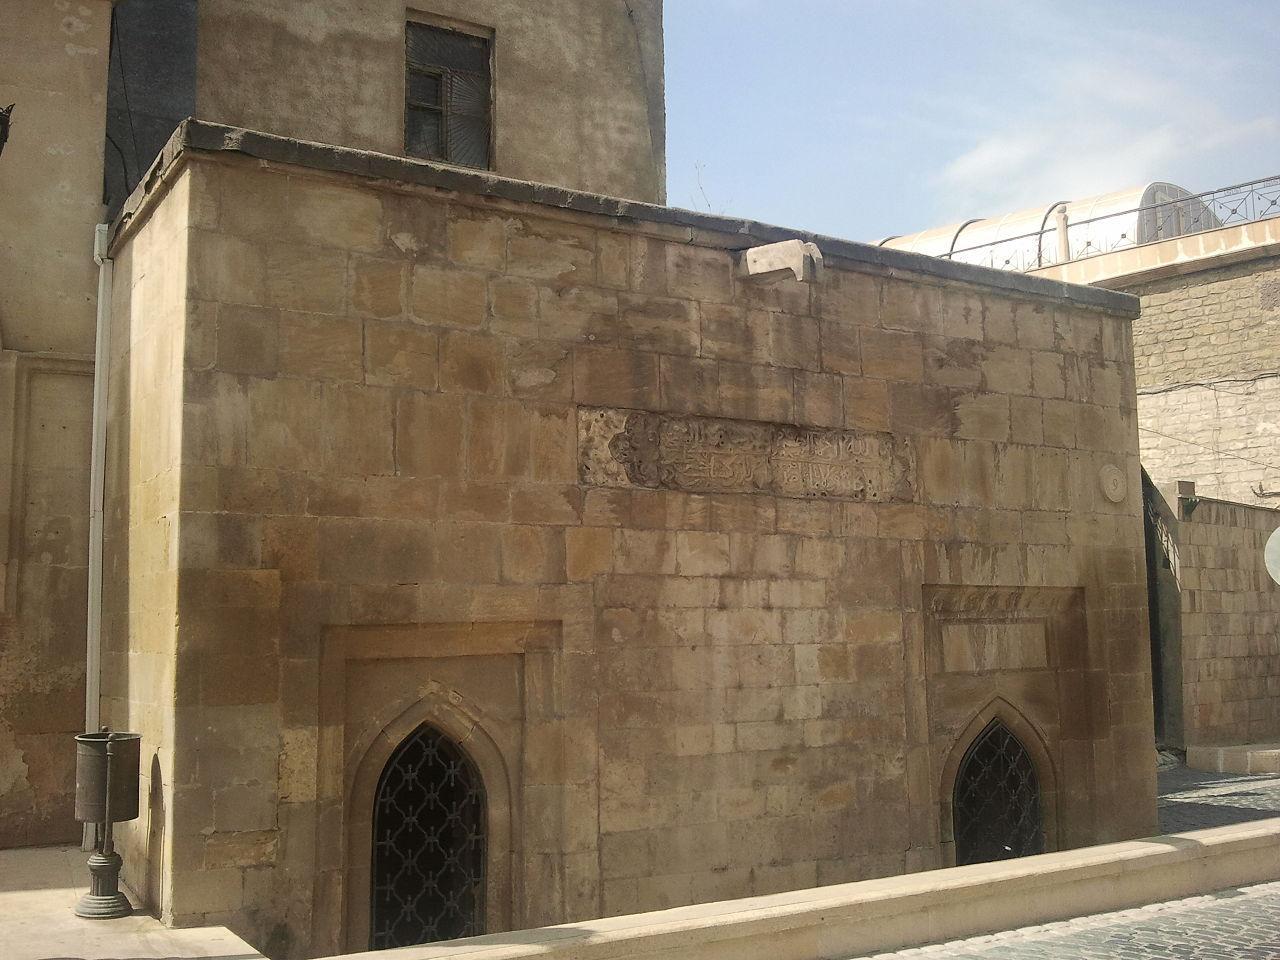 molla ahmed mechet baku azerbaydzhan1 - Mosque of Haji Mirza Ahmed